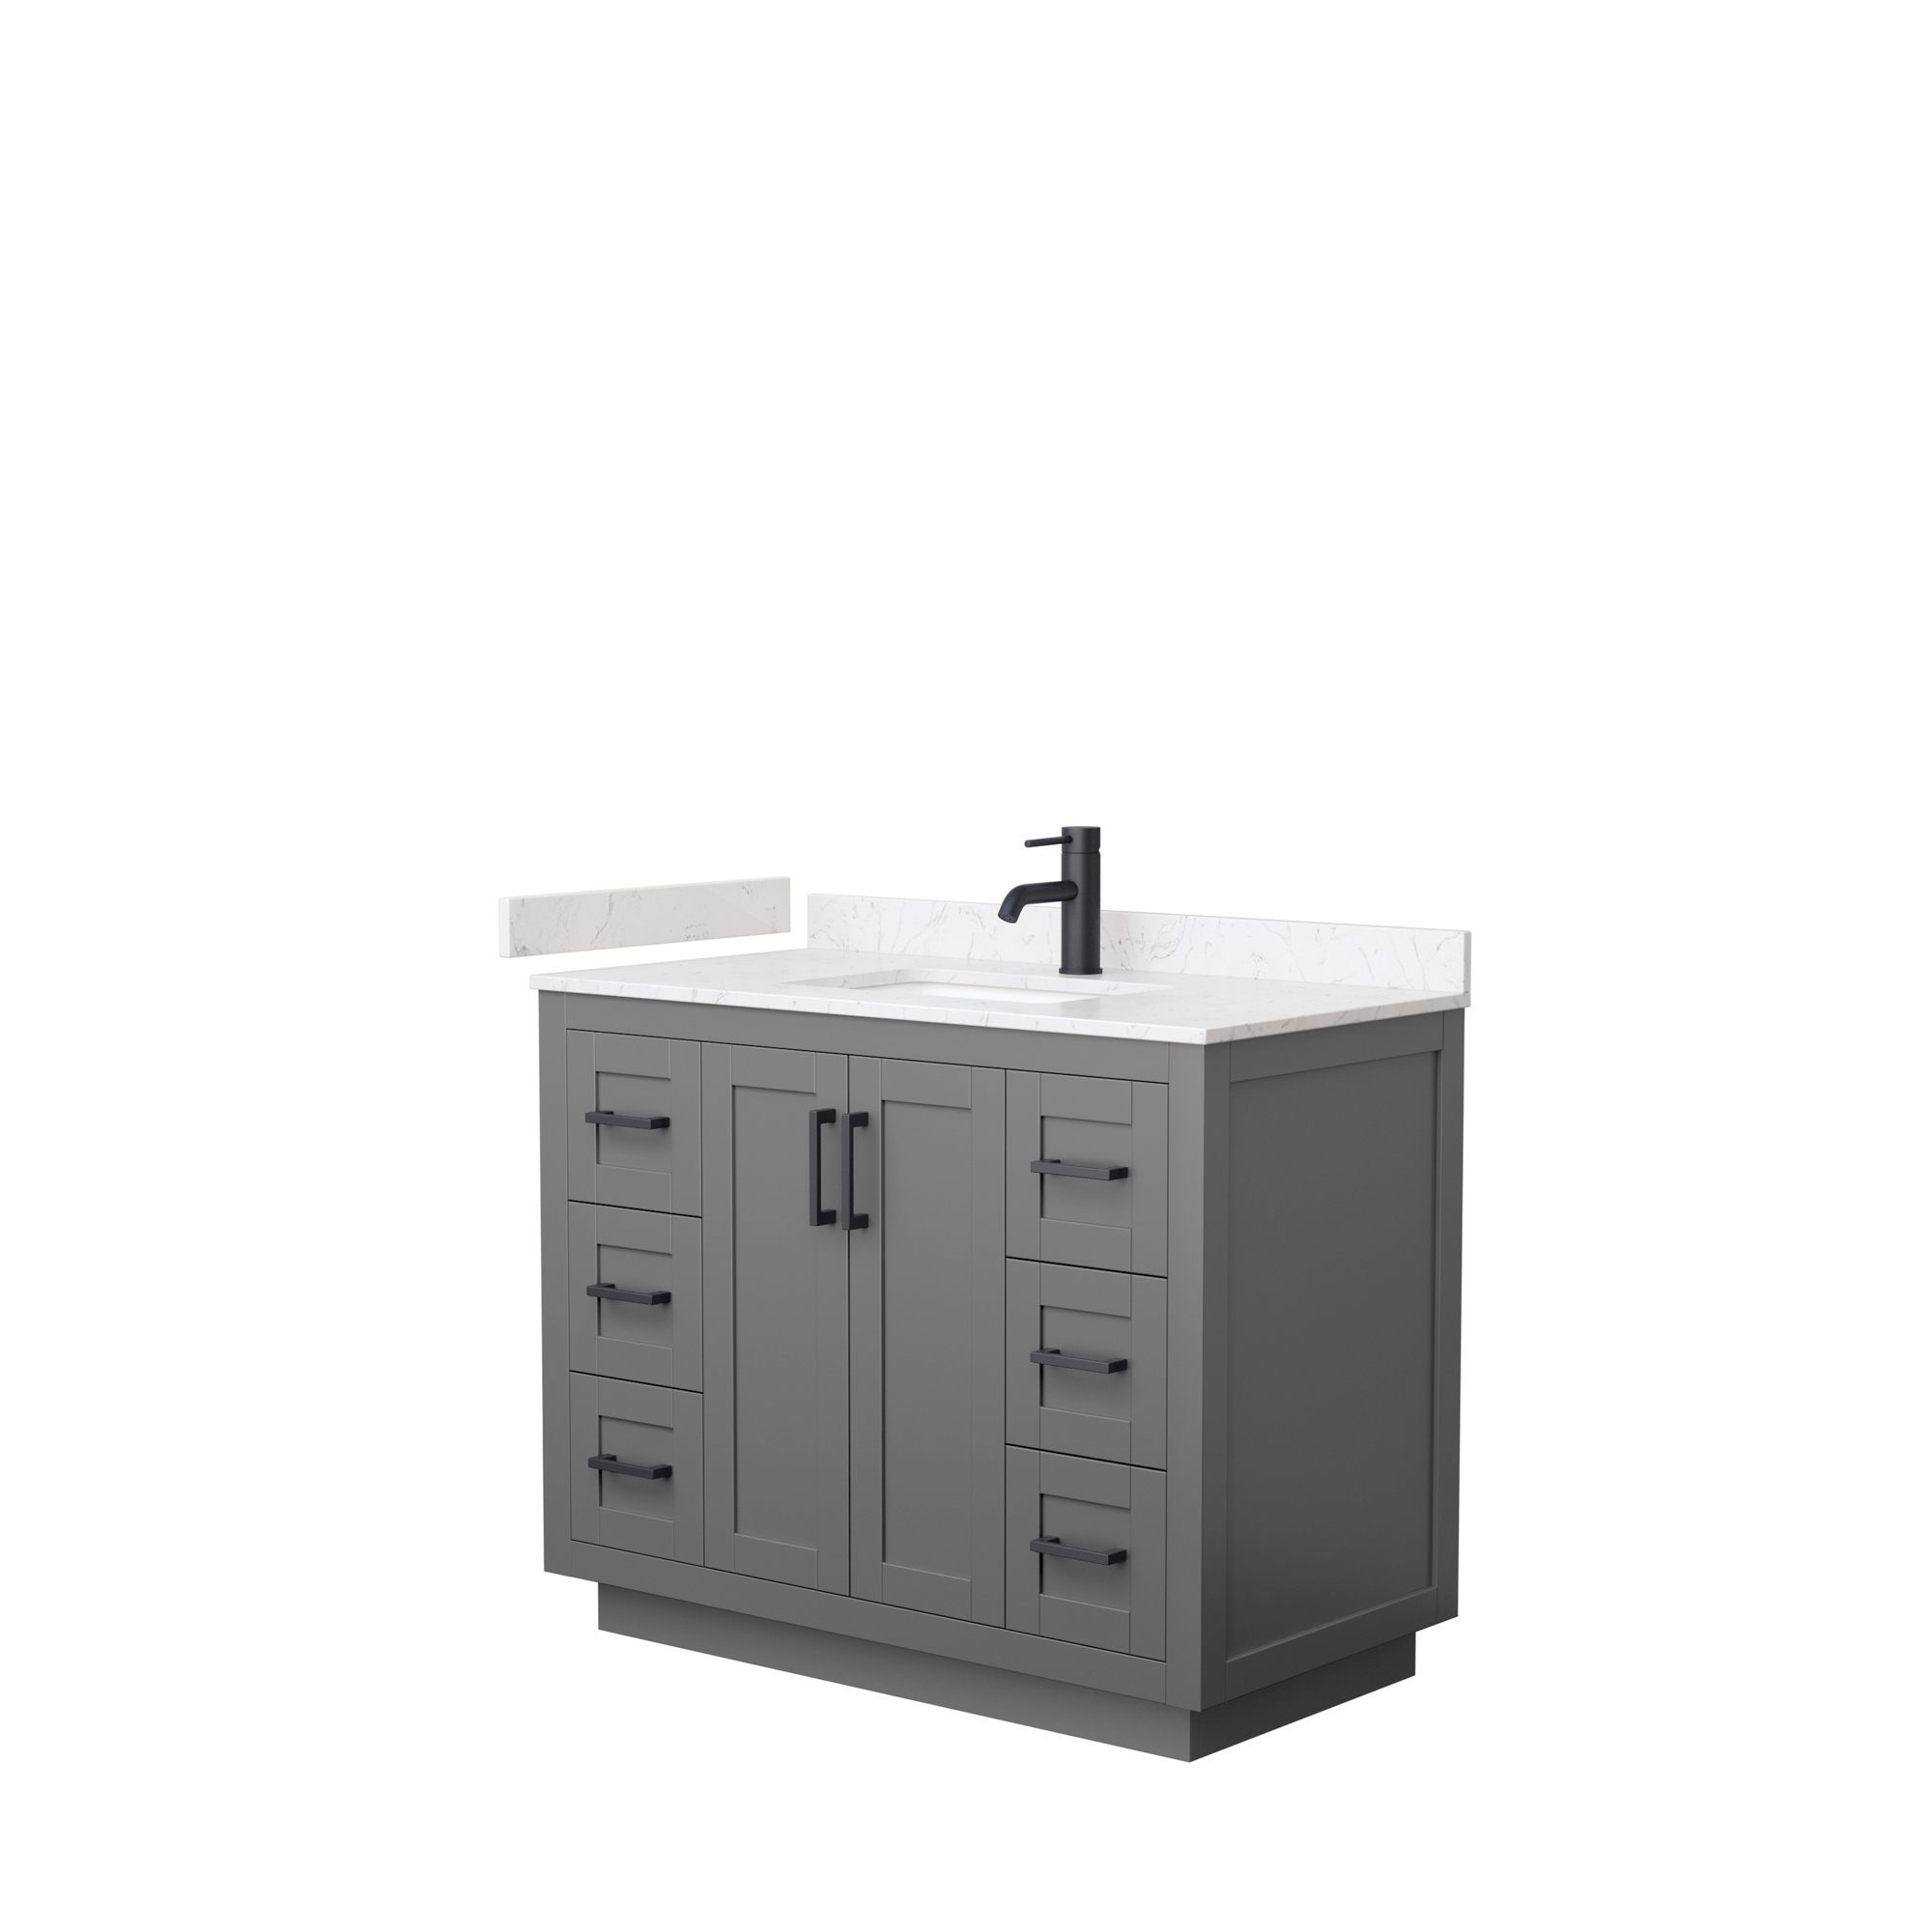 "42"" Single Bathroom Vanity in Dark Gray, Light-Vein Carrara Cultured Marble Countertop, Undermount Square Sink, Matte Black Trim"